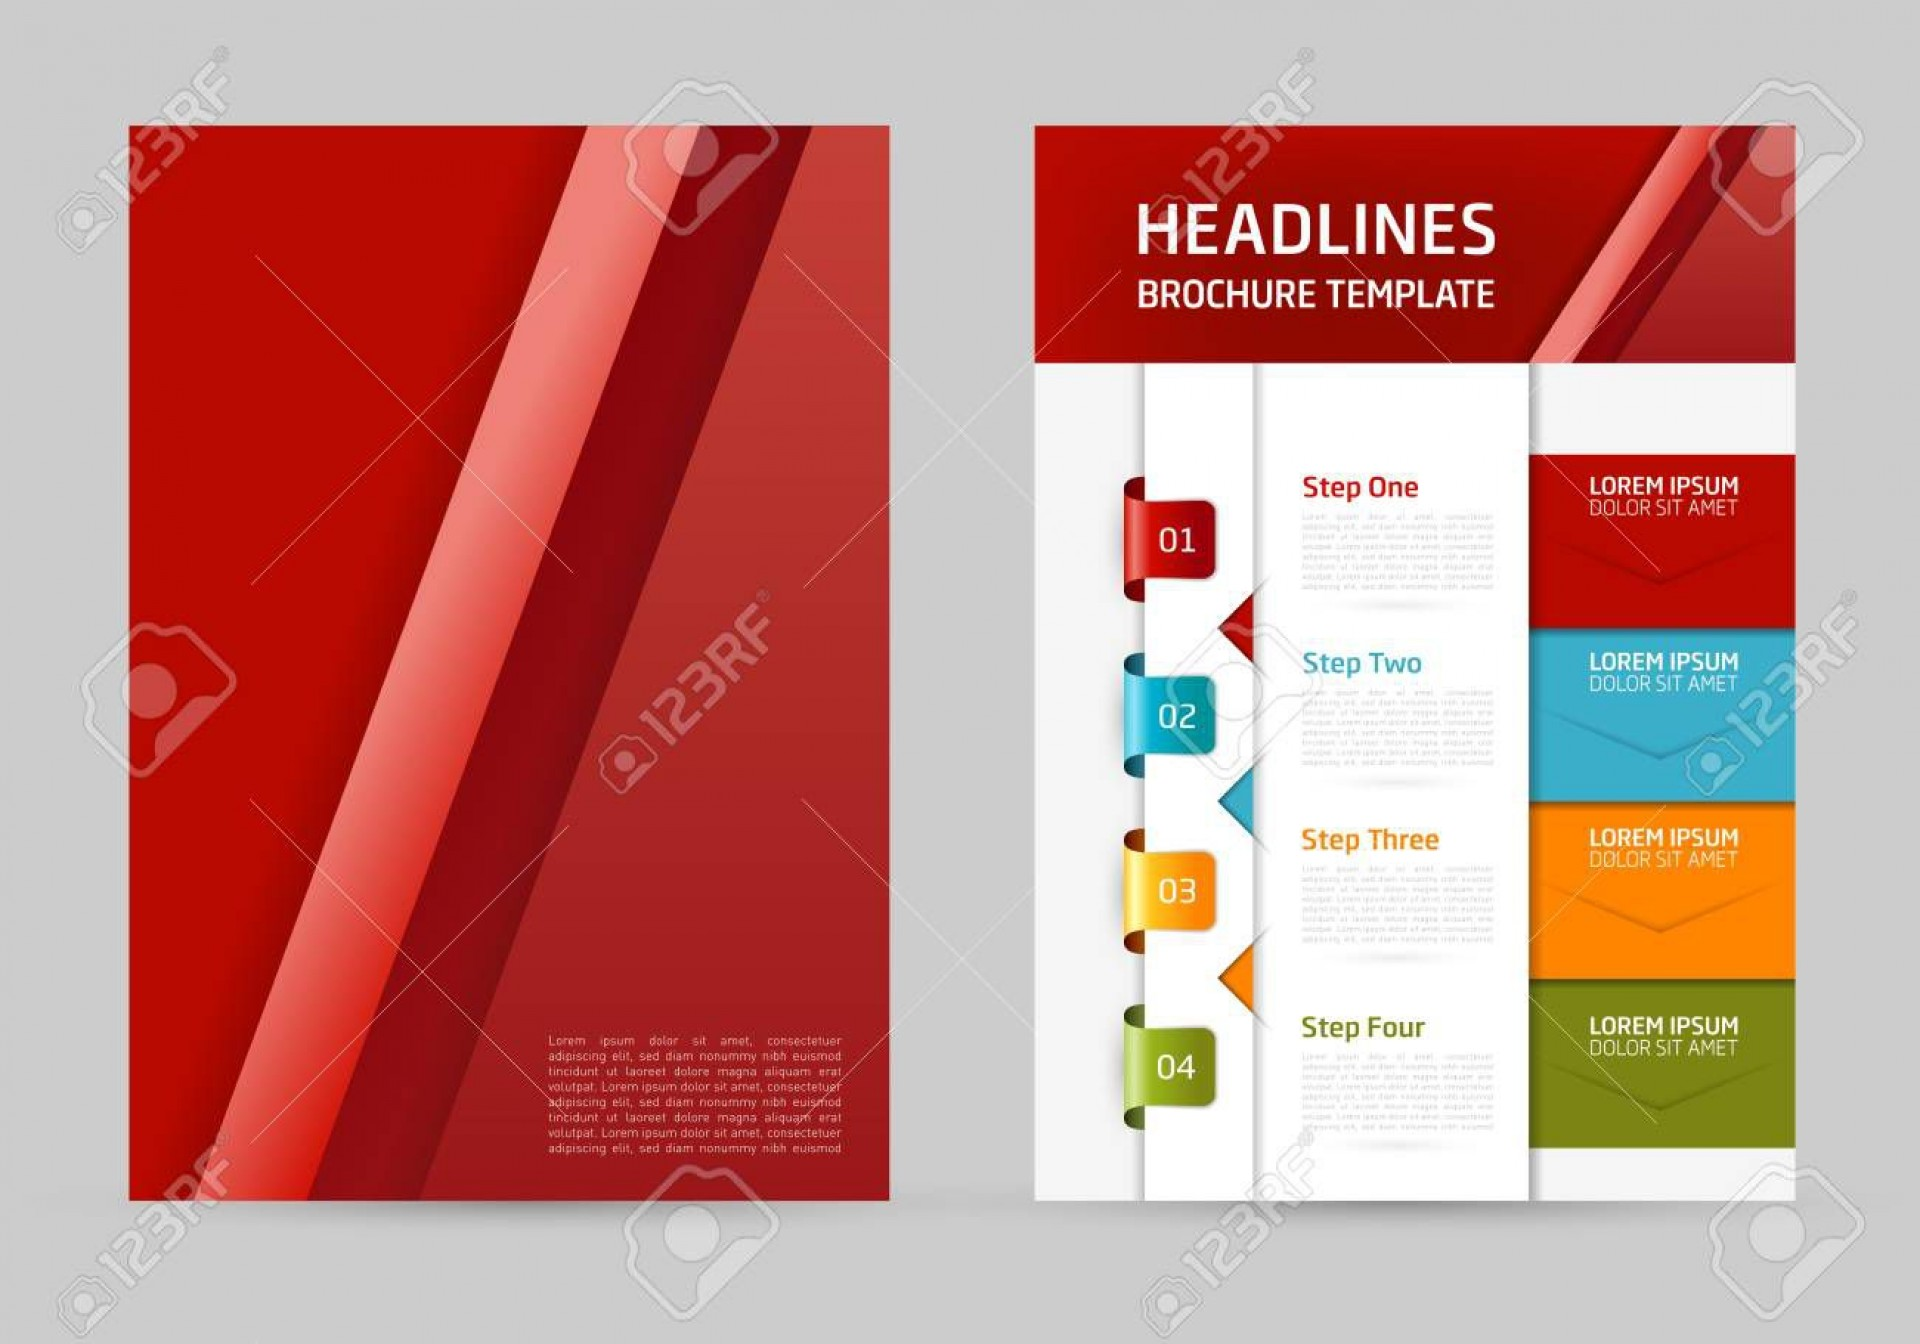 003 Stupendou Free Flyer Design Template  Templates Online Download Psd1920